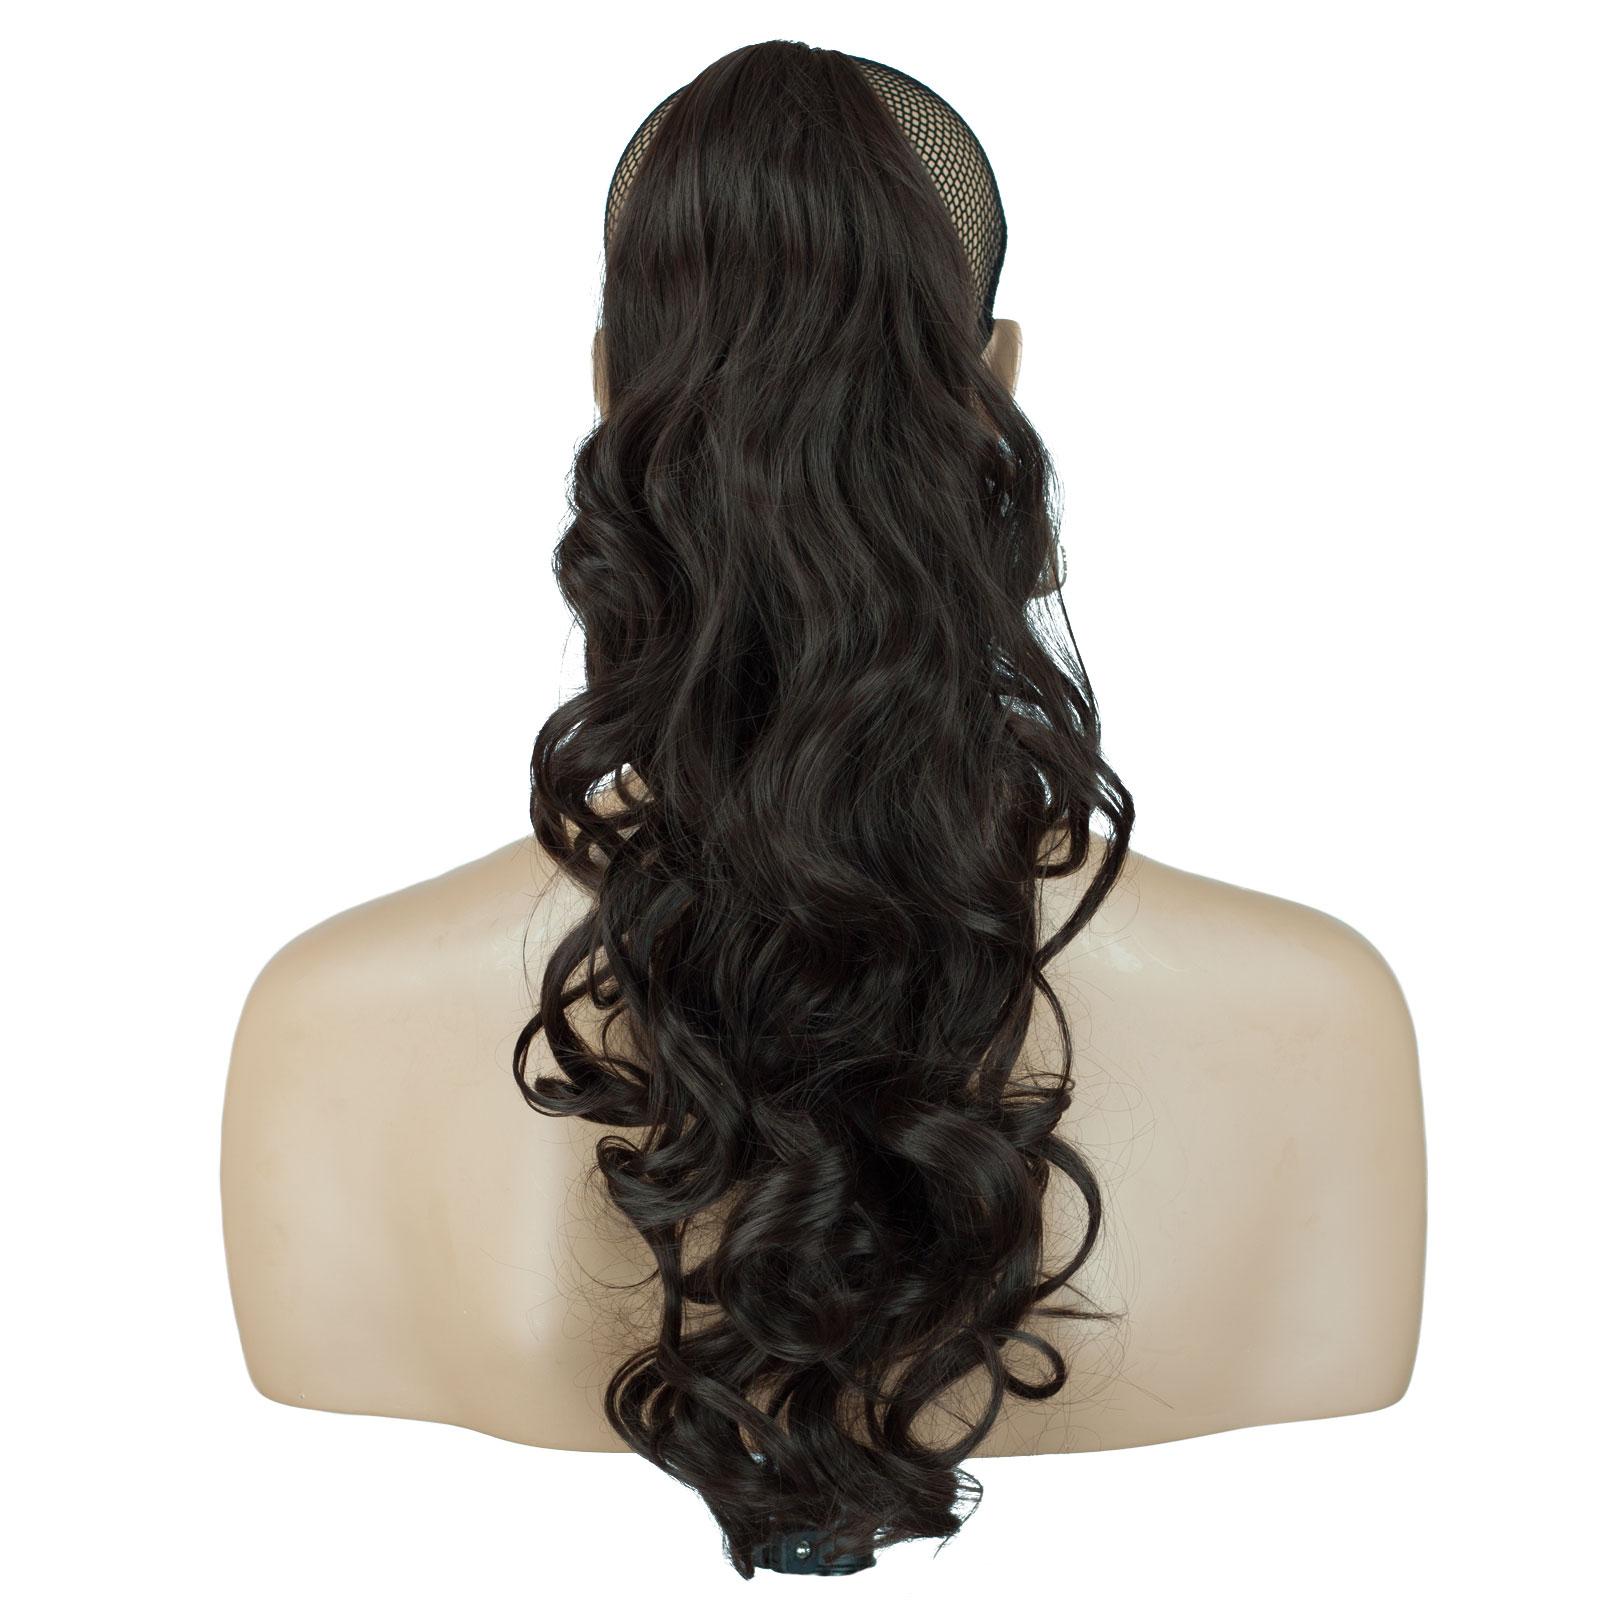 Ponytail Clip In Hair Extensions Medium Brown 6 Reversible 4 Styles